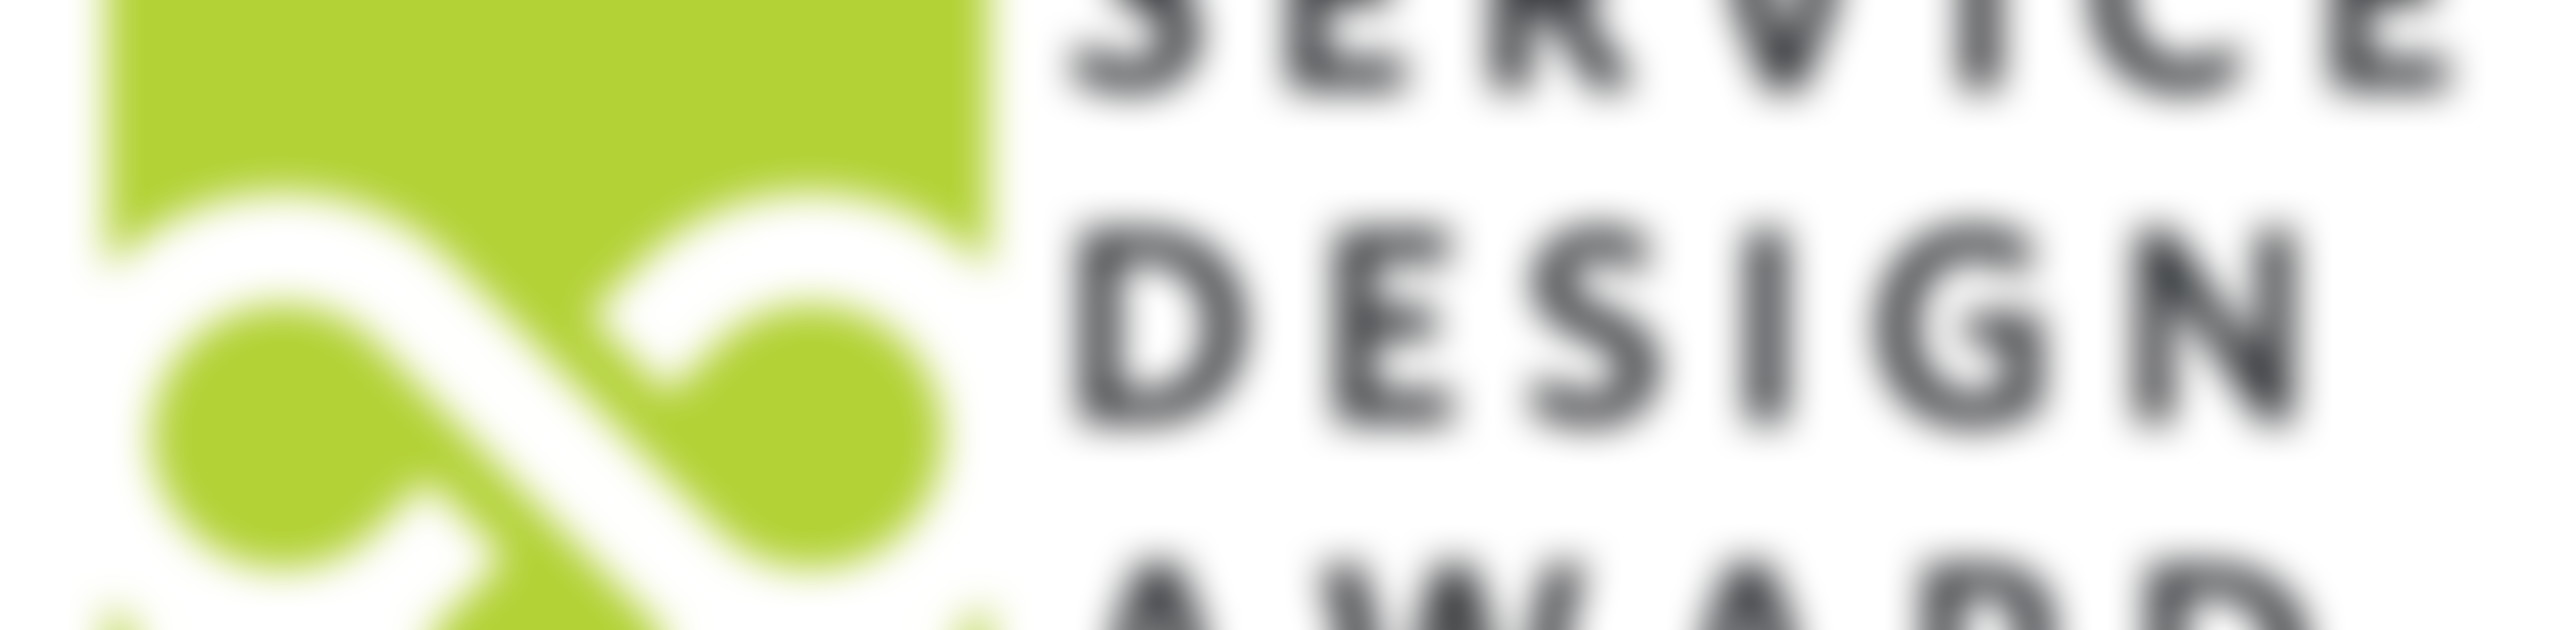 Service Design Award 2020: Finalists Selected